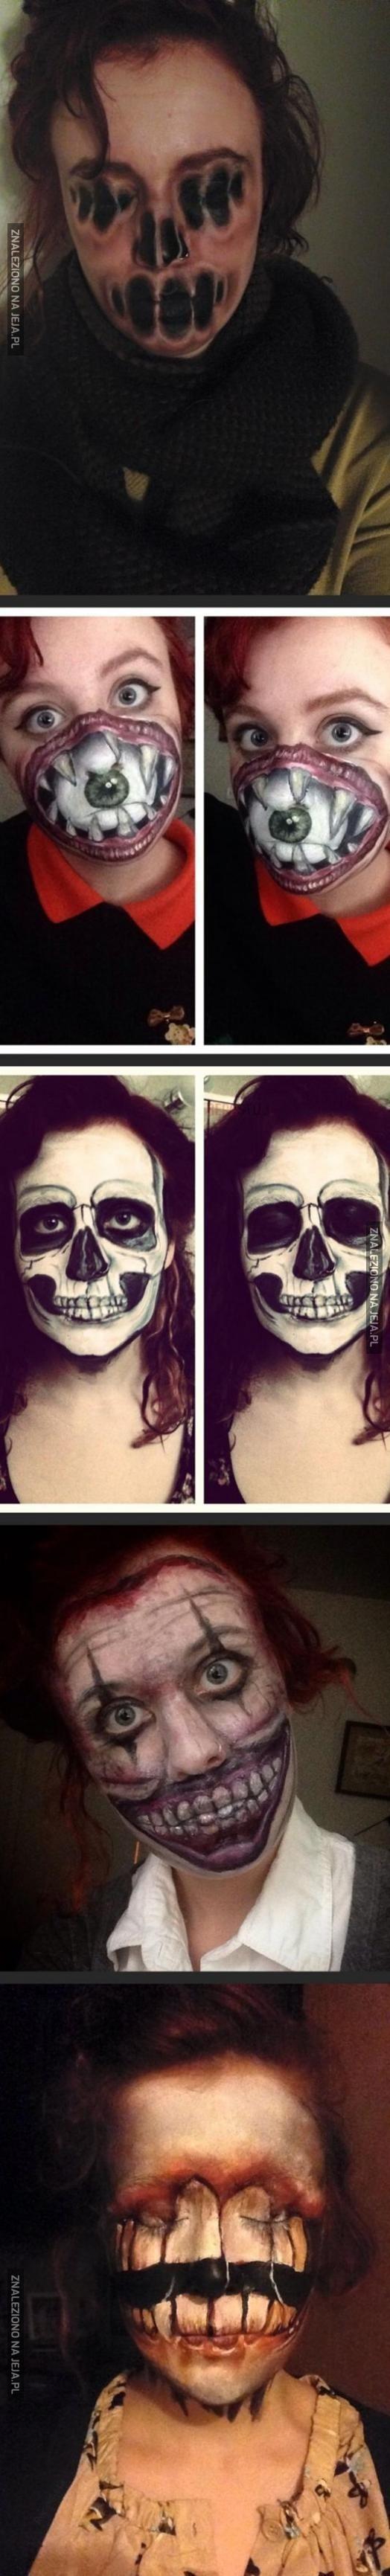 Potworne makijaże